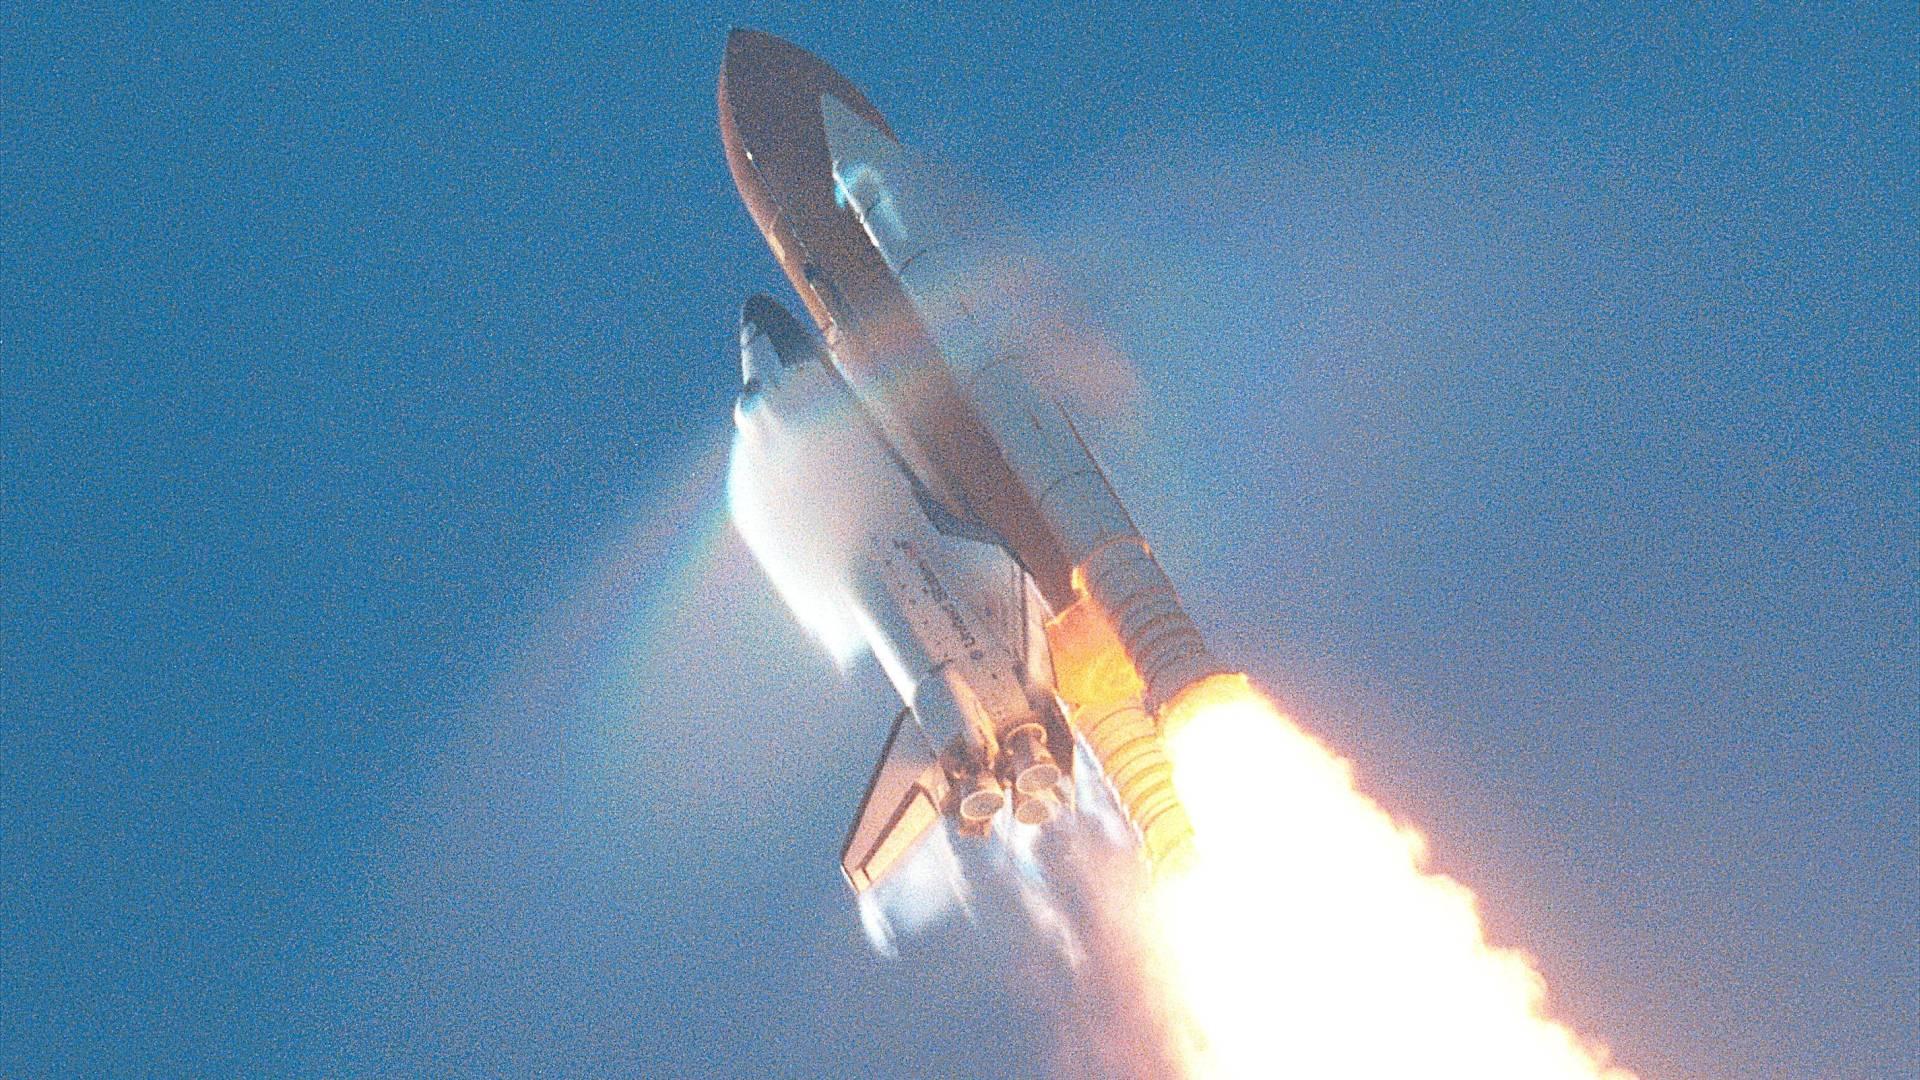 space shuttle columbia wallpaper - photo #35